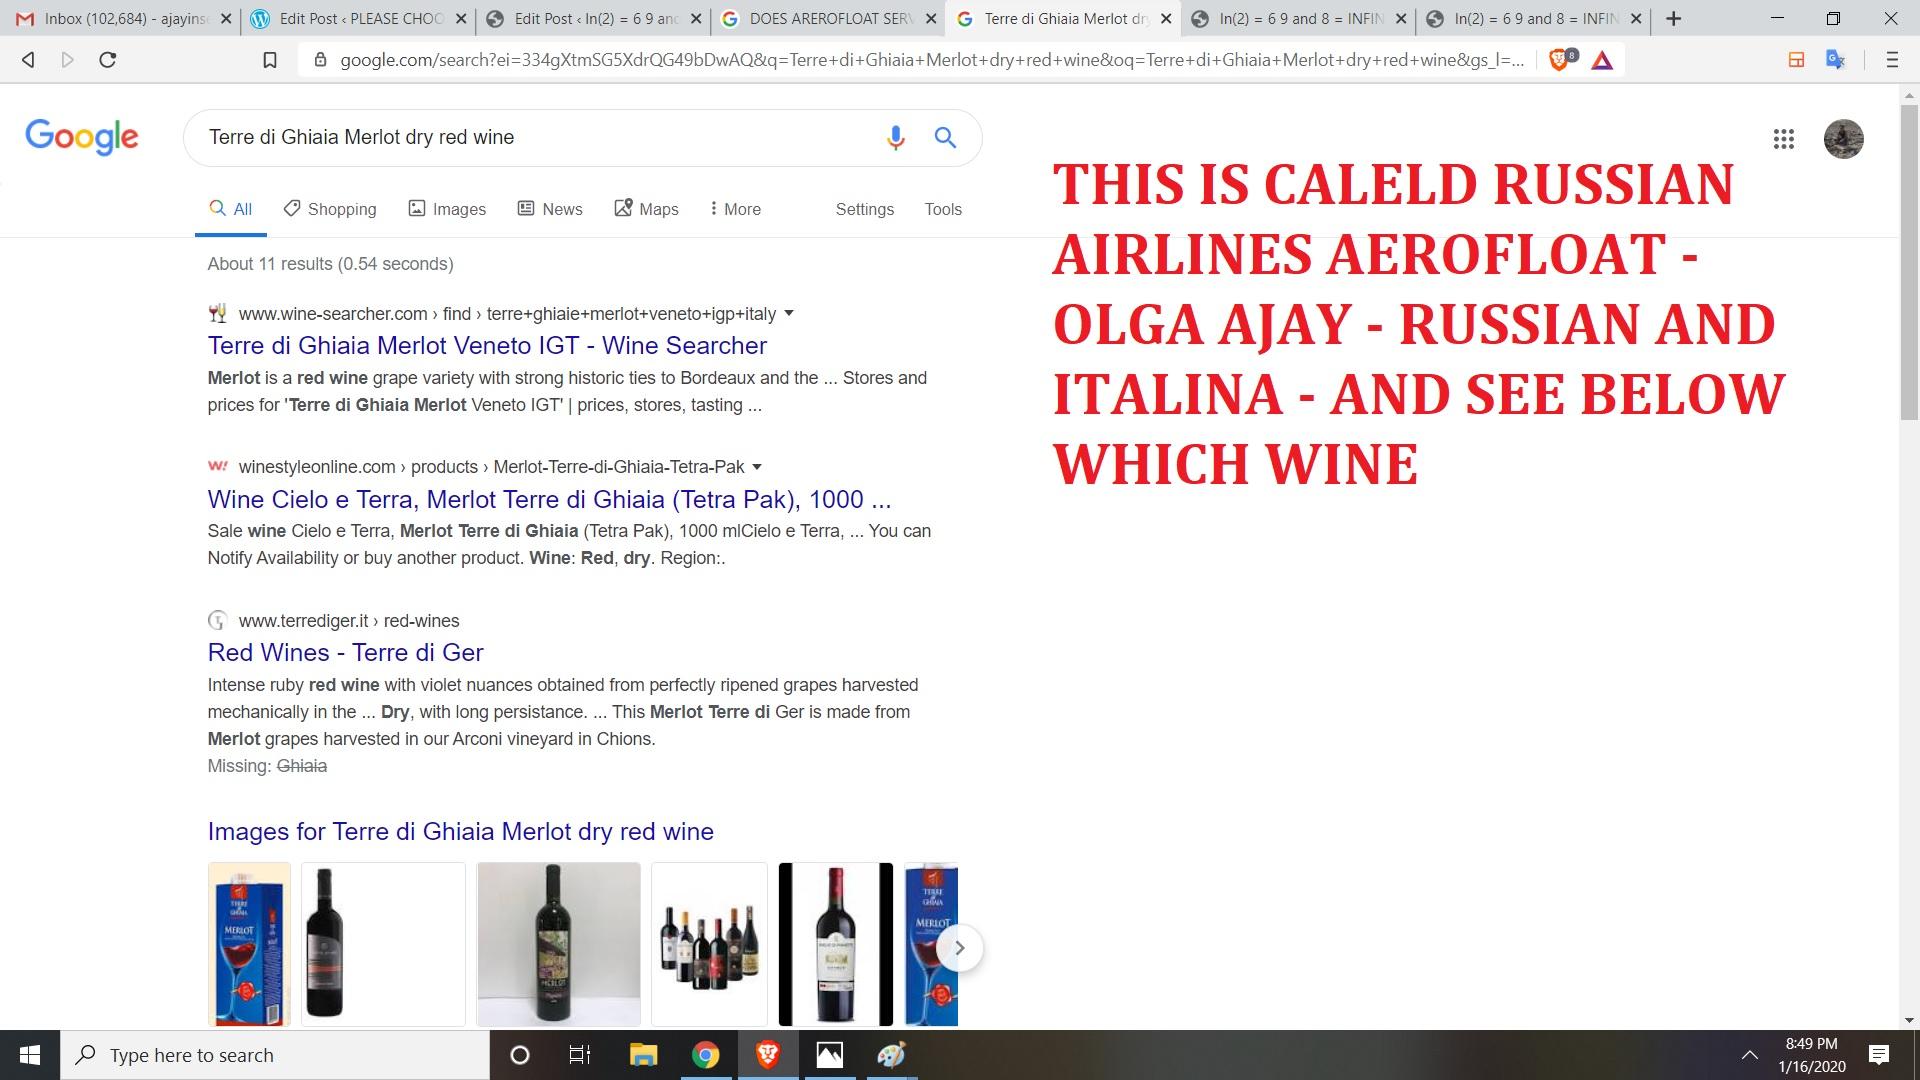 AEROFLOAT RED WINE